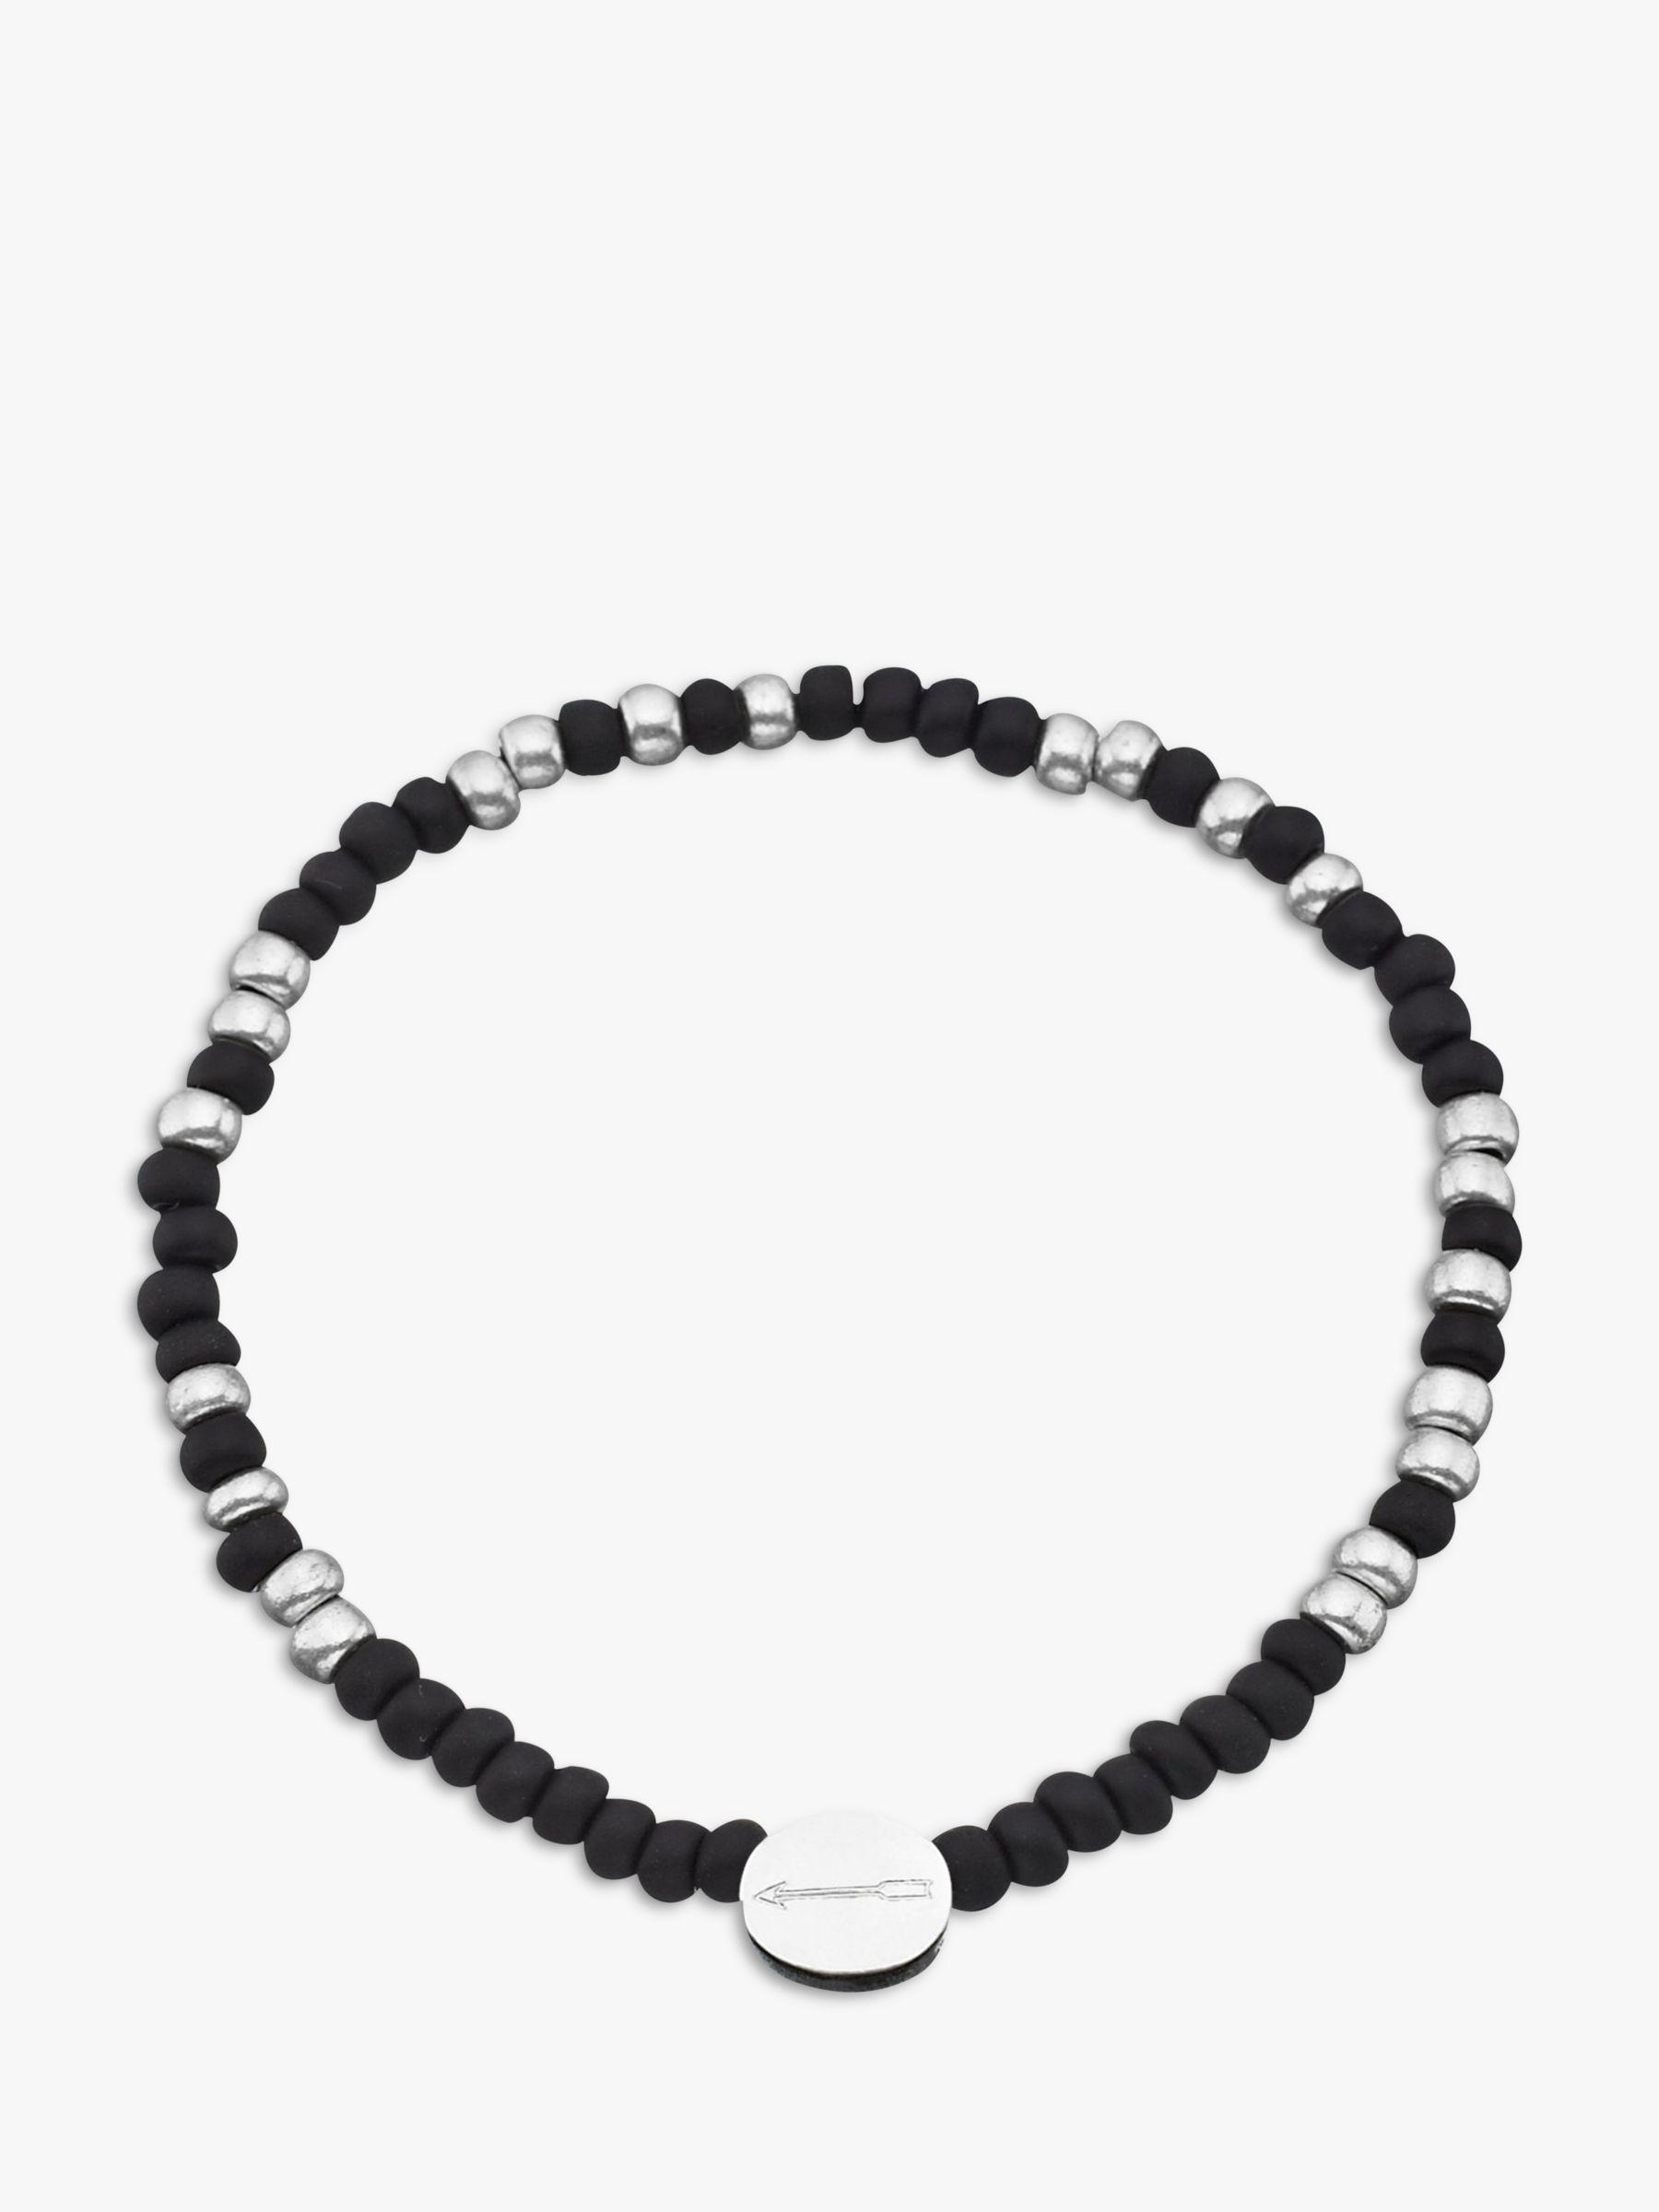 Under The Rose Under the Rose Morse Code 'Daddy' Bead Bracelet